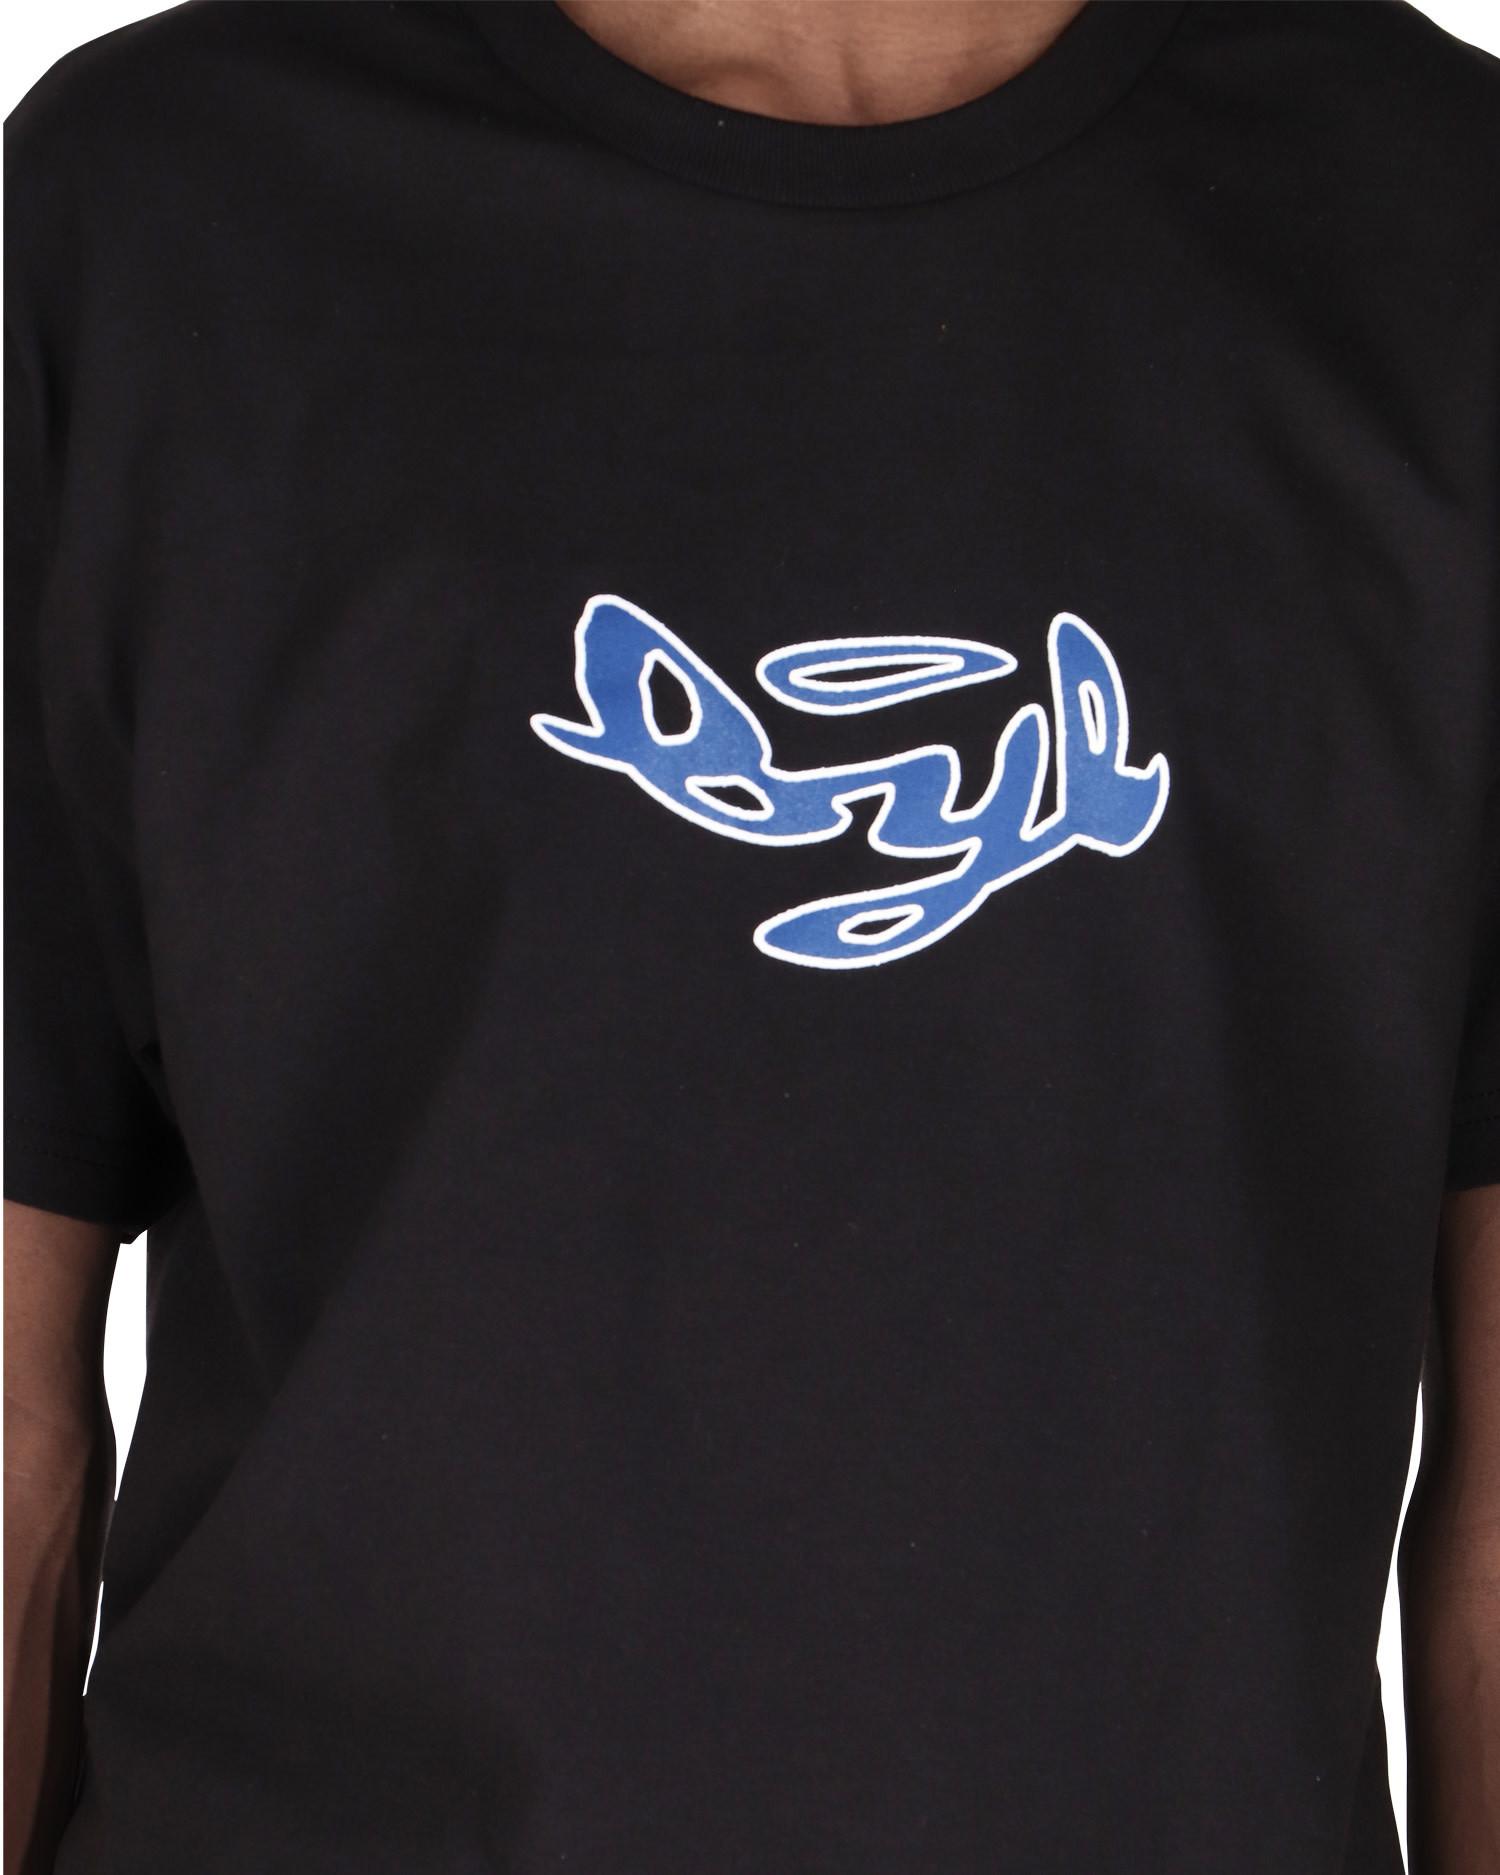 Bye Jeremy Blue And White Logo T-shirt